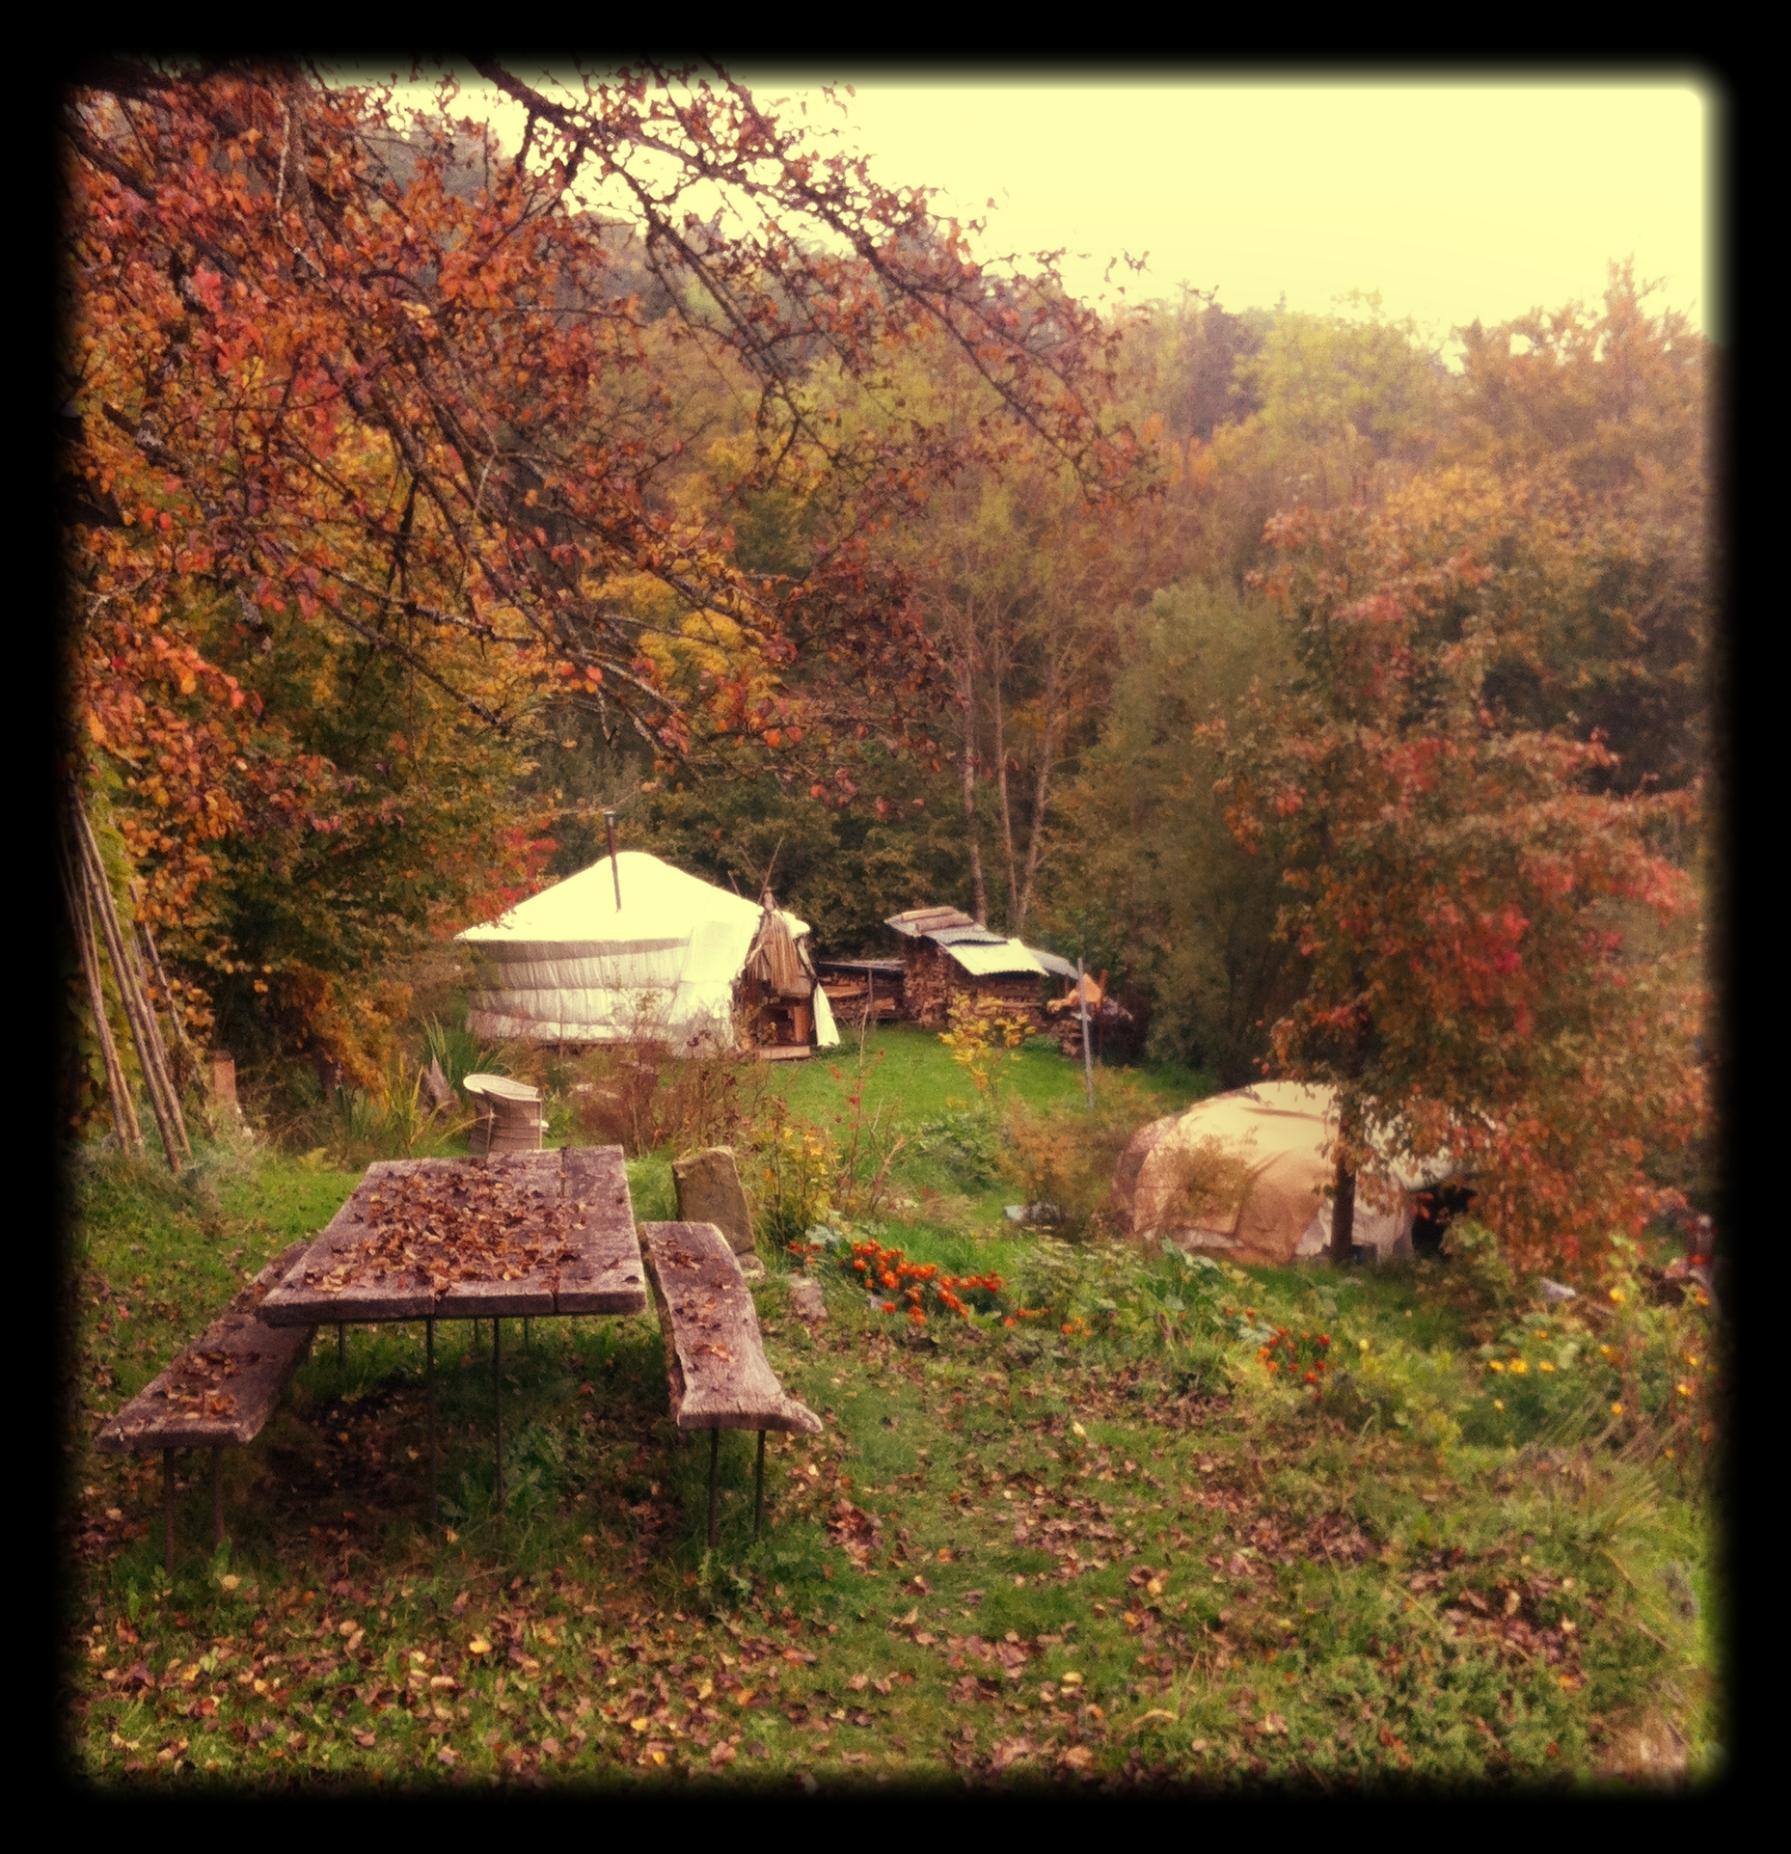 Autumn_colour_a_yurt_a_picnic_table_a_sweatlodge